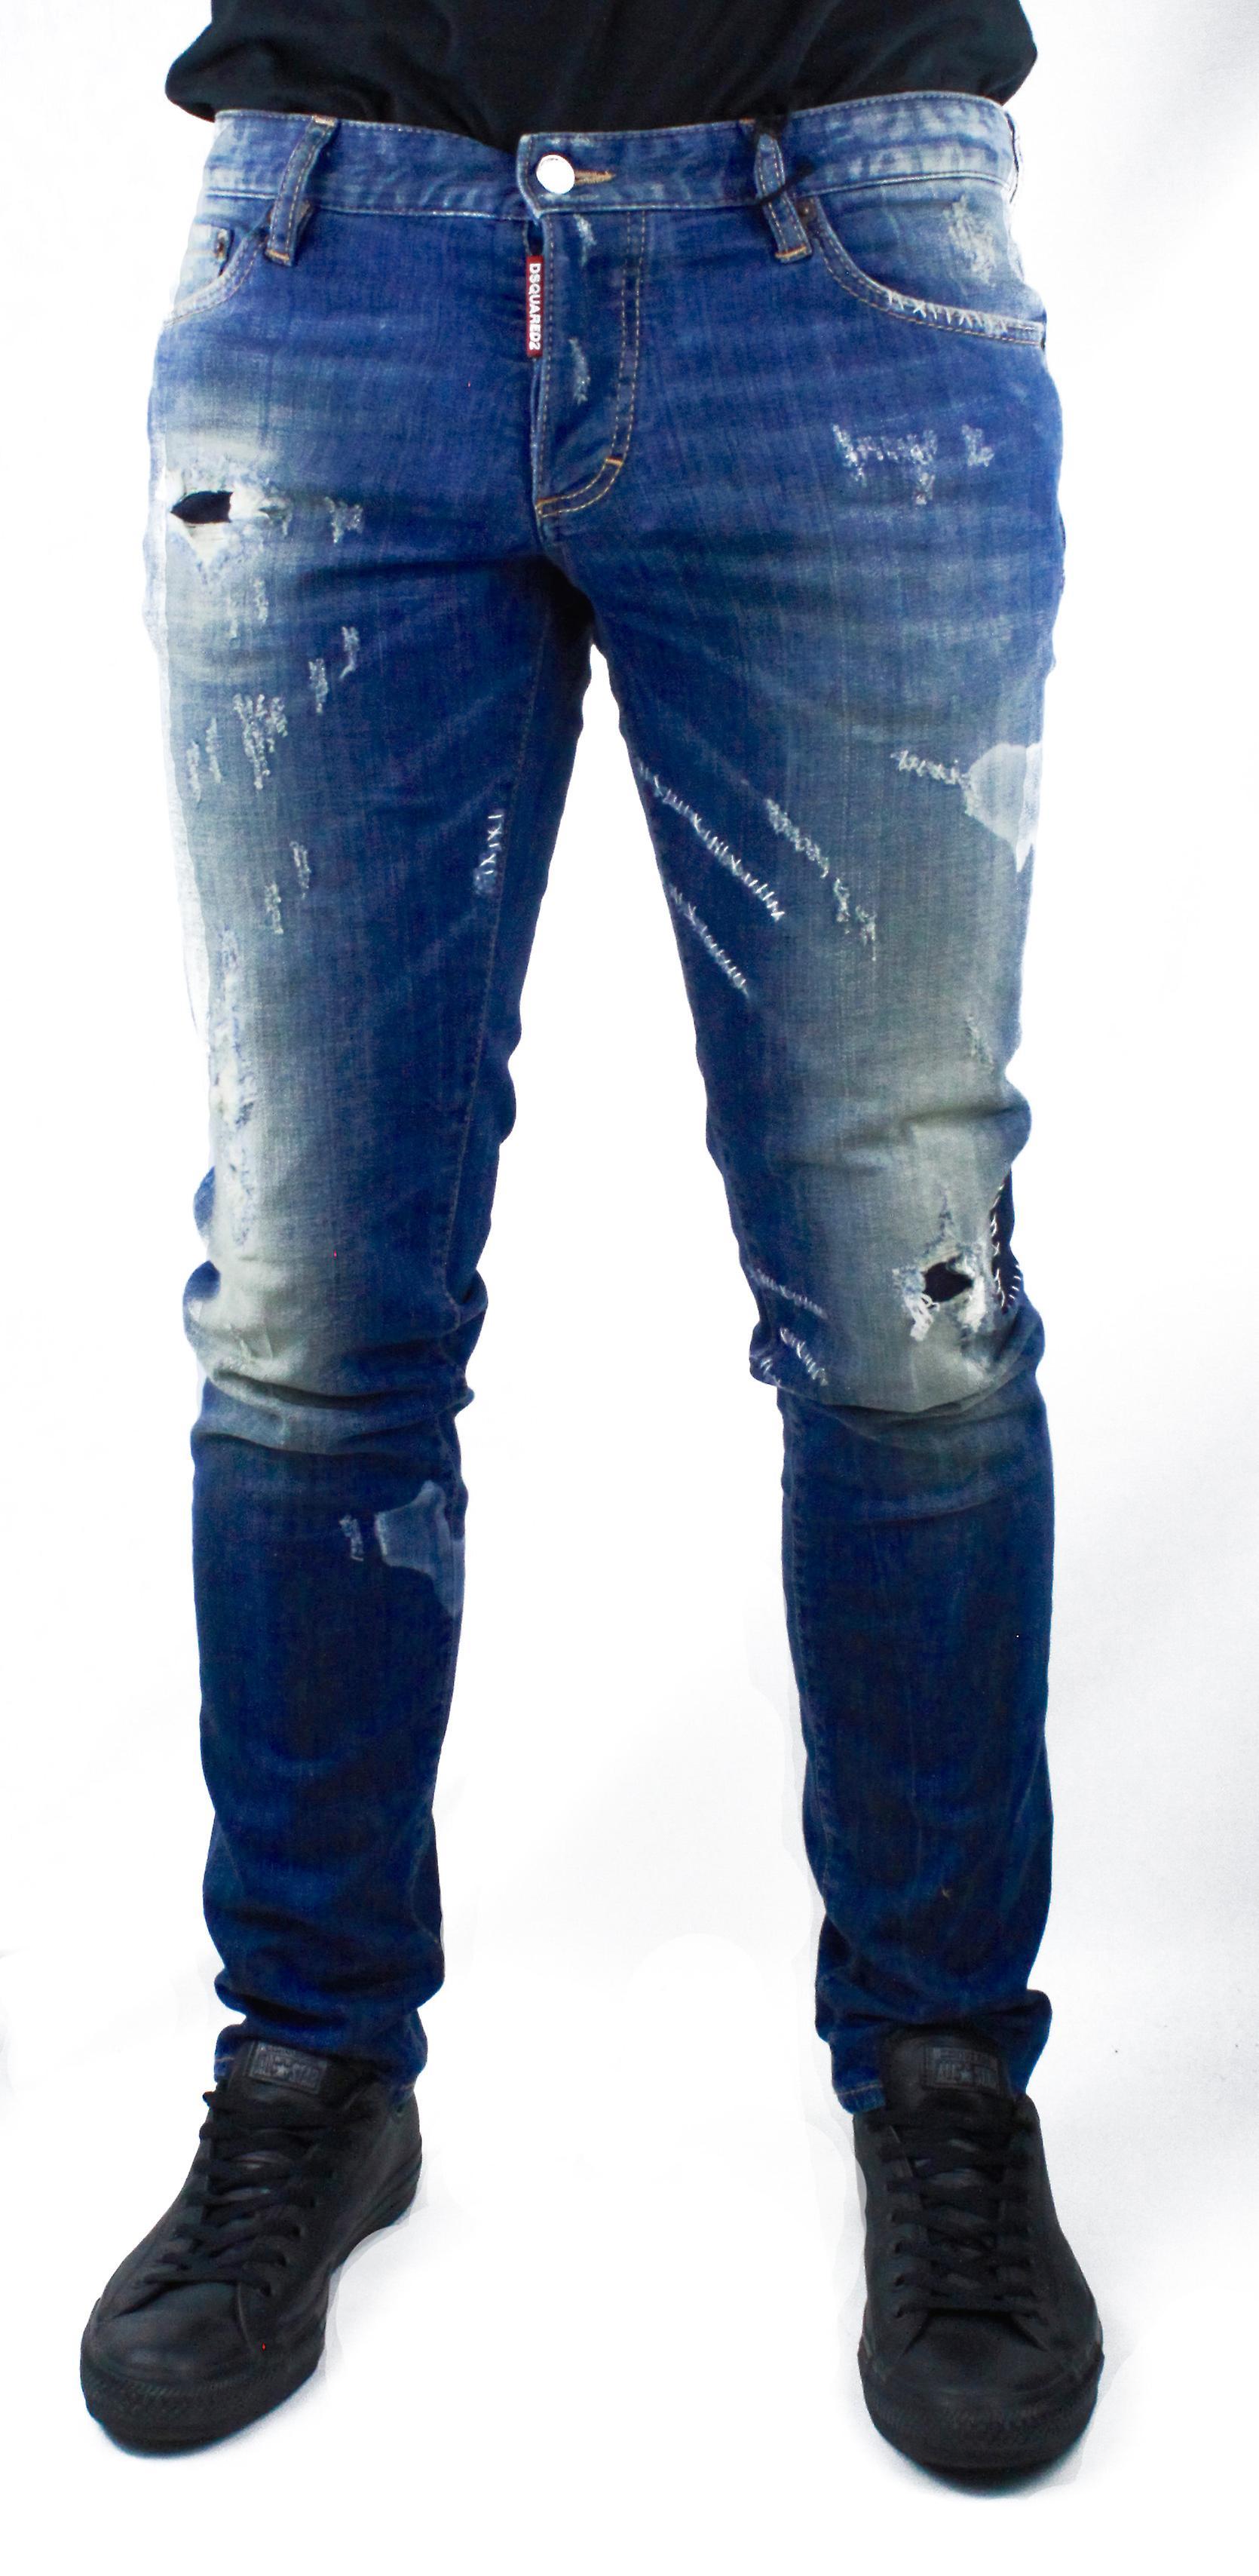 DSquared2 slank S71LB0211 Jeans